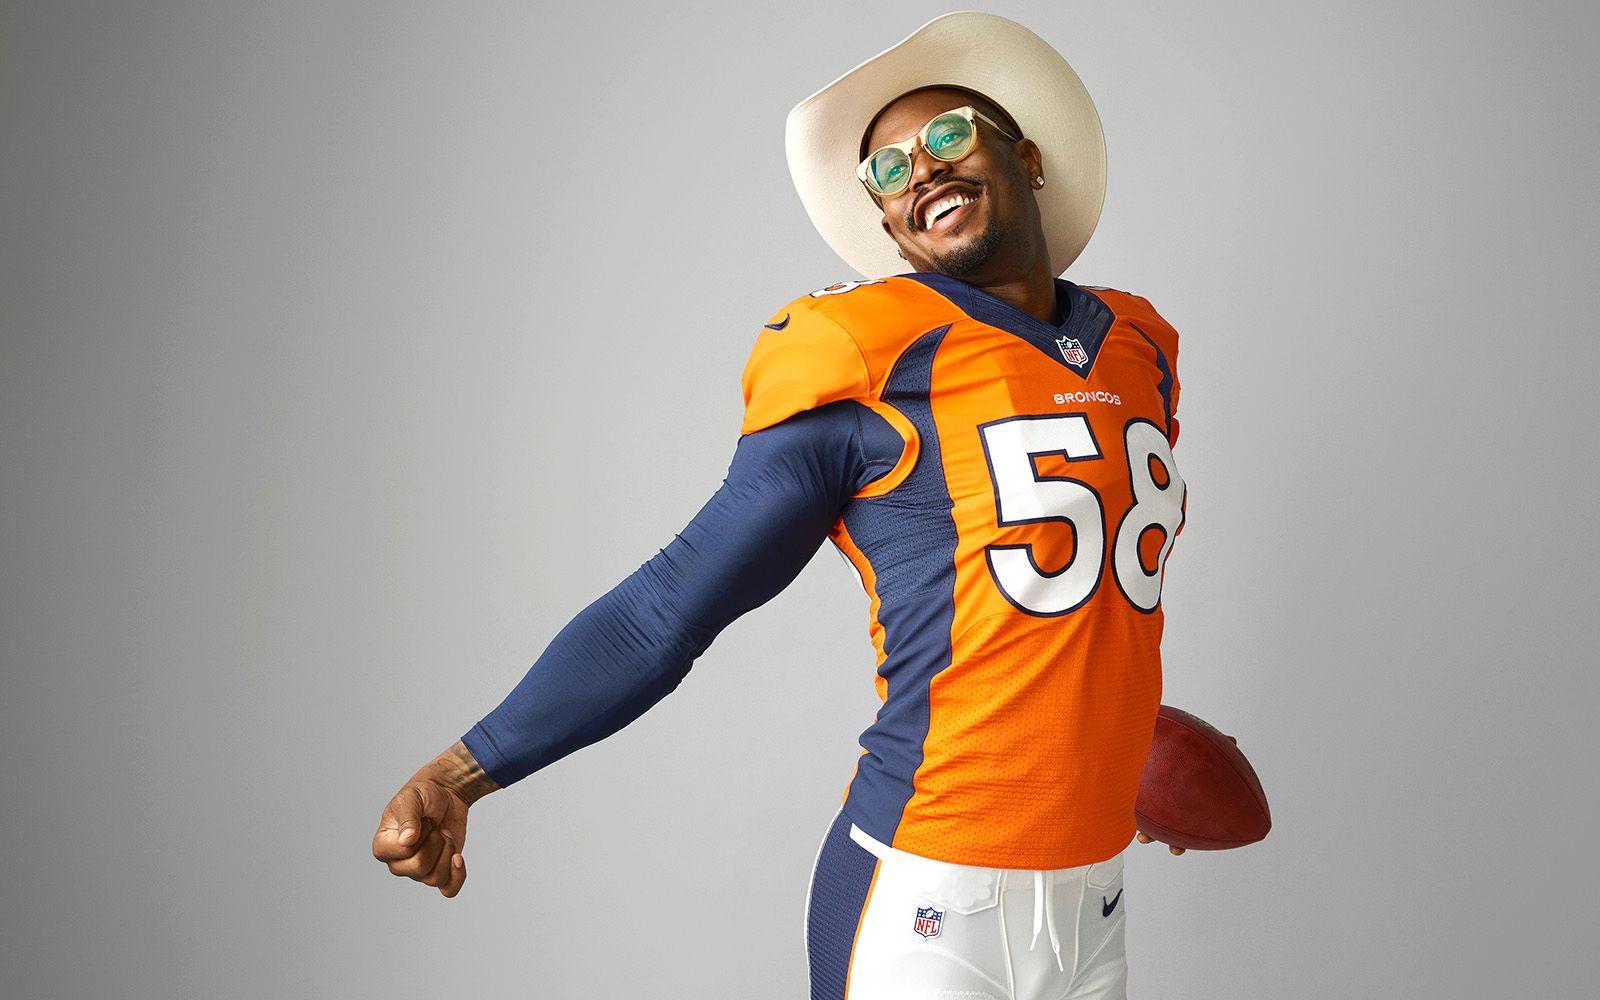 e2d421eb0 Denver Broncos star Von Miller has a new contract